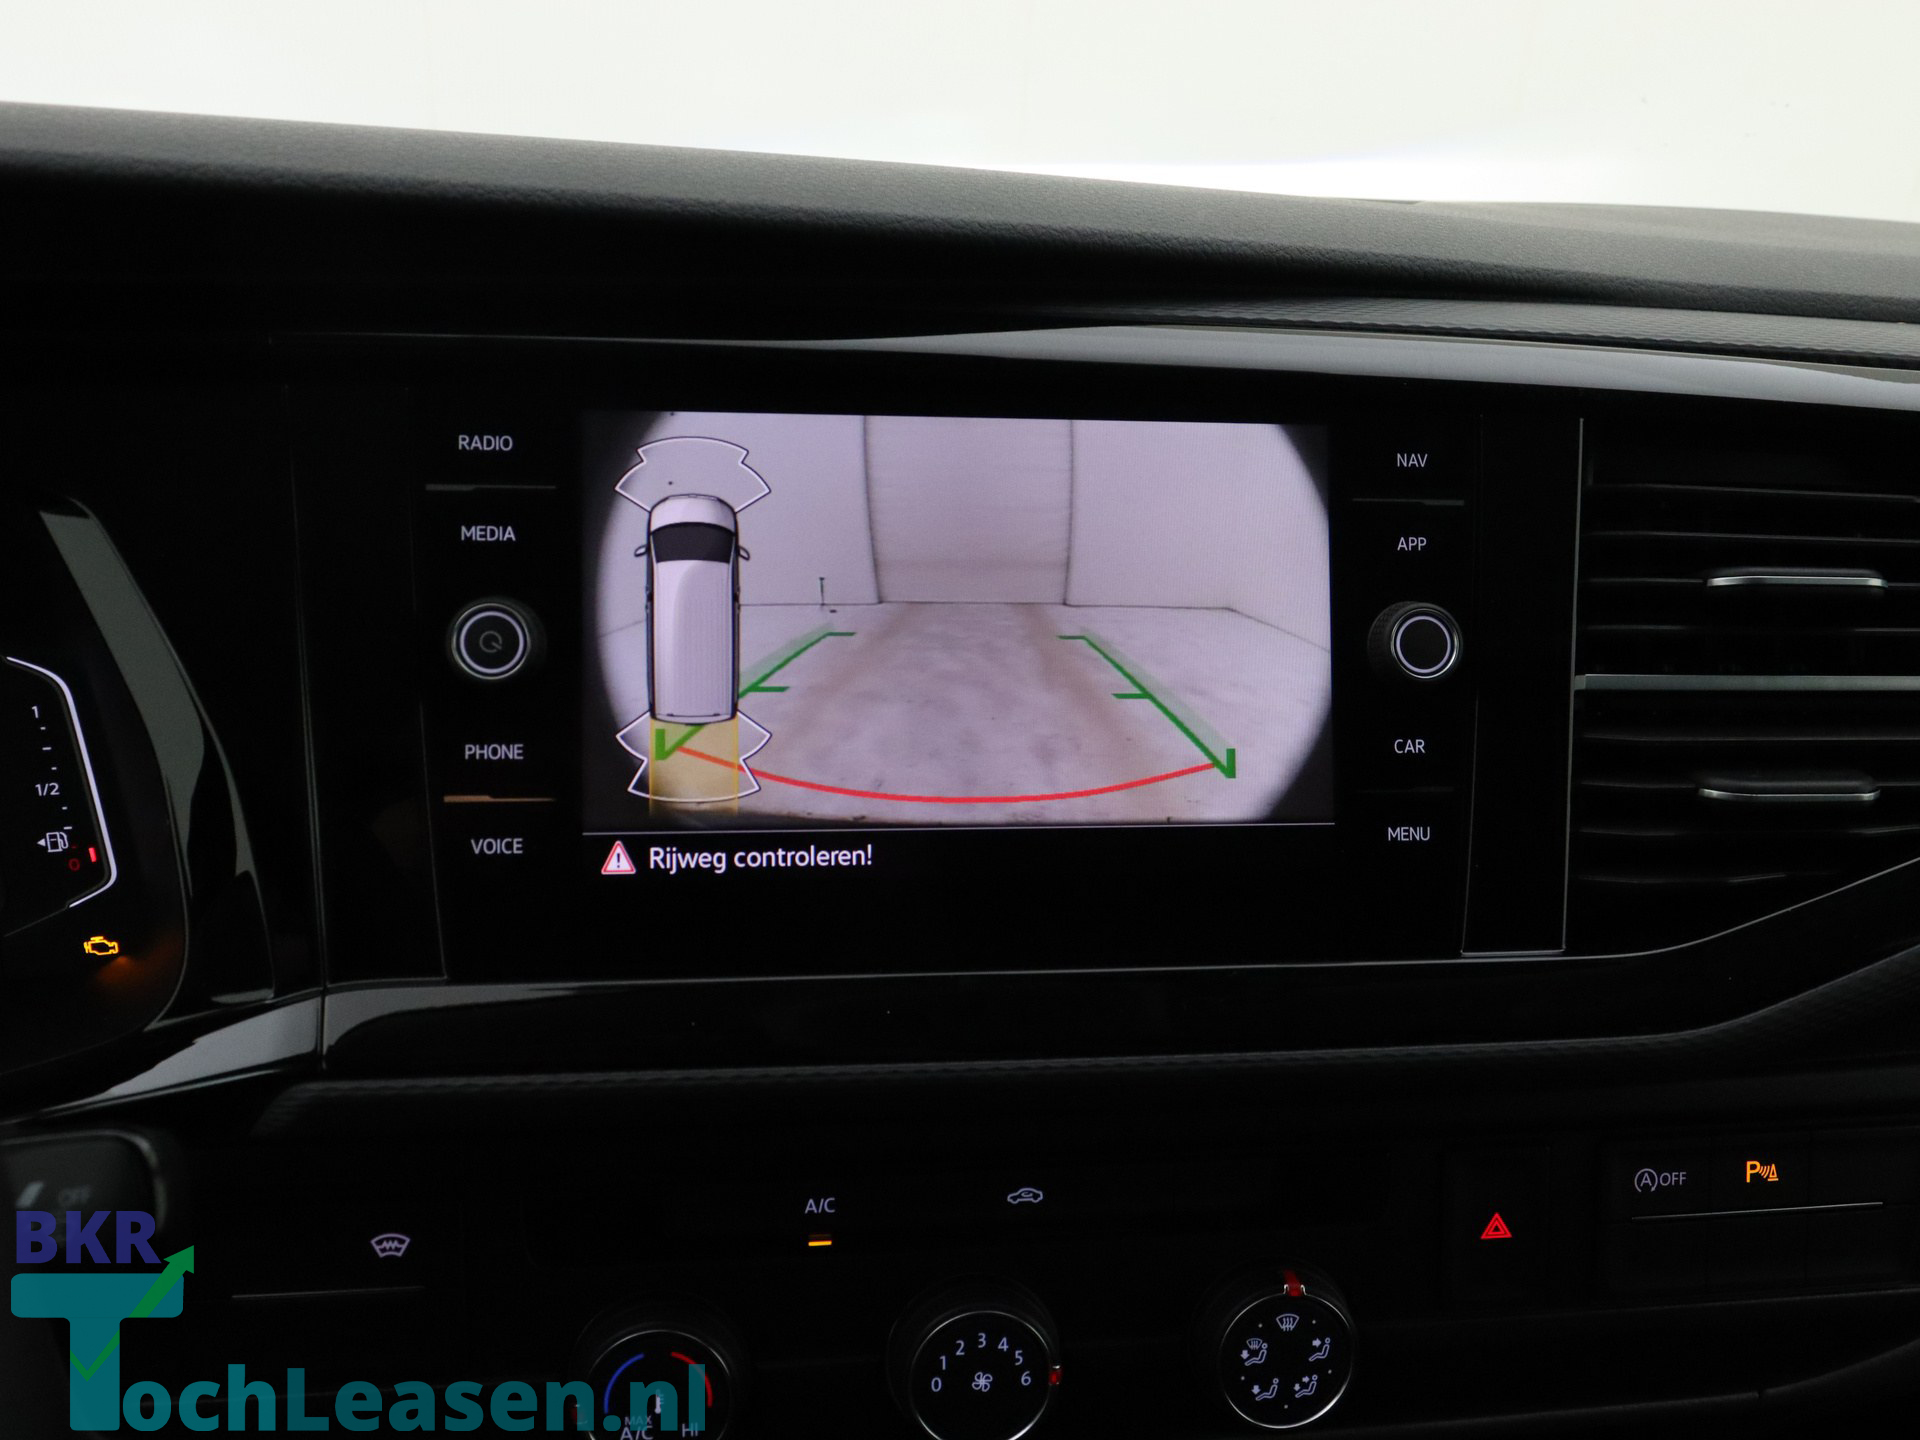 BKR toch leasen - Volkswagen Transporter - Grijs 11